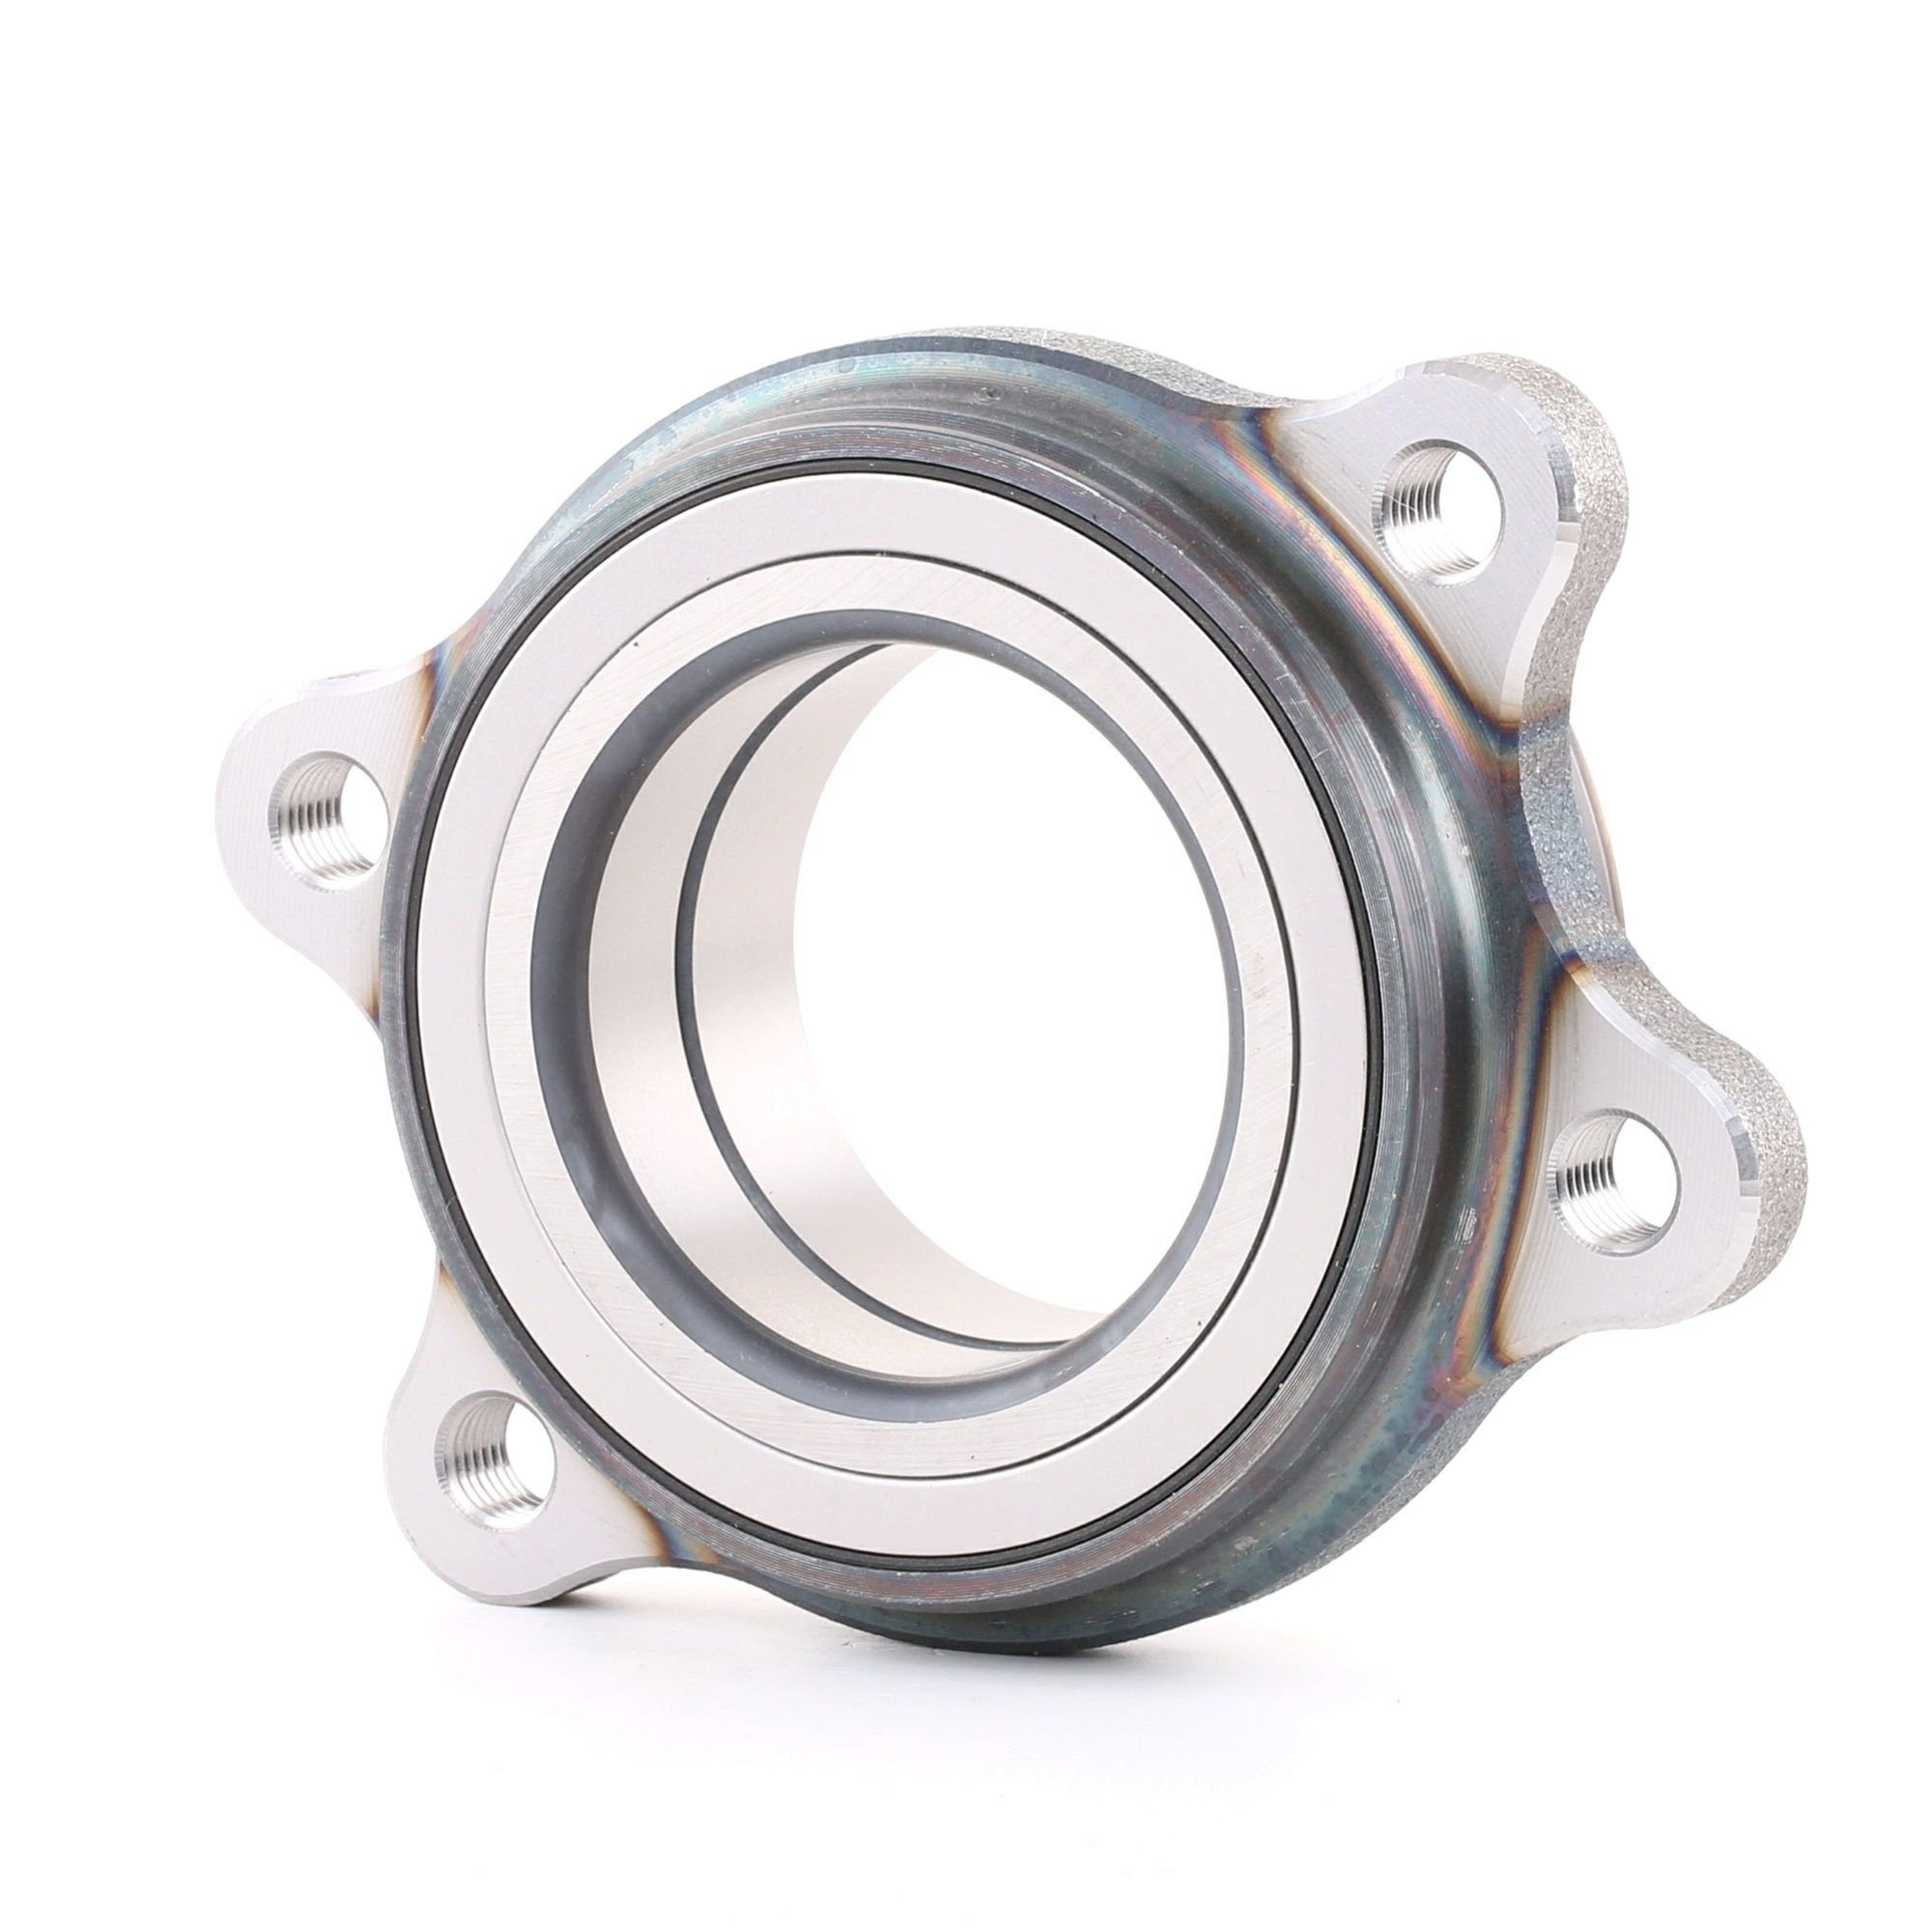 Wheel Bearing FAG 713 6109 00 rating